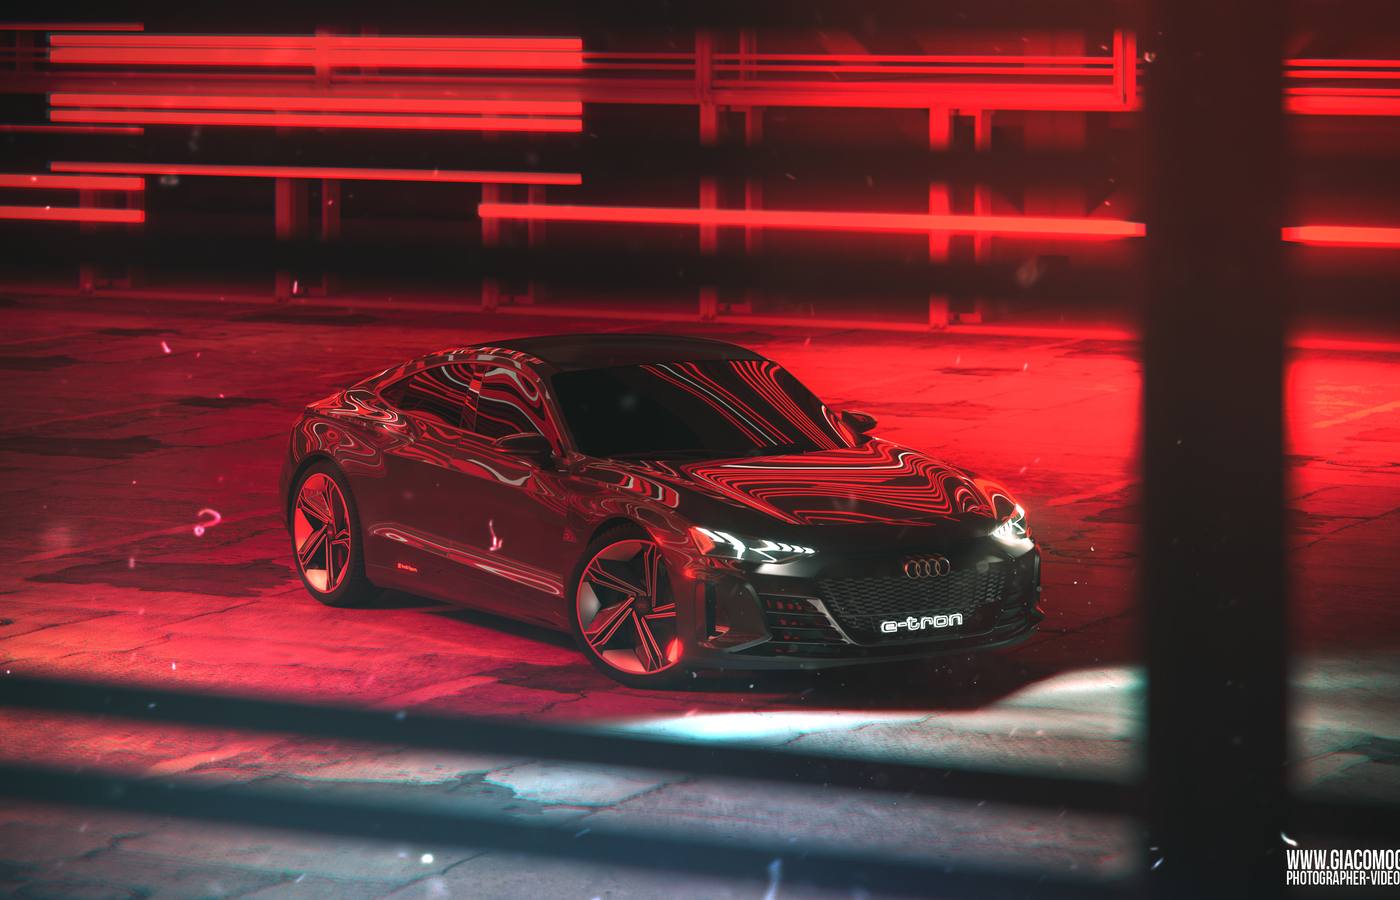 2020-audi-etron-gt-automotive-rendering-4k-qq.jpg